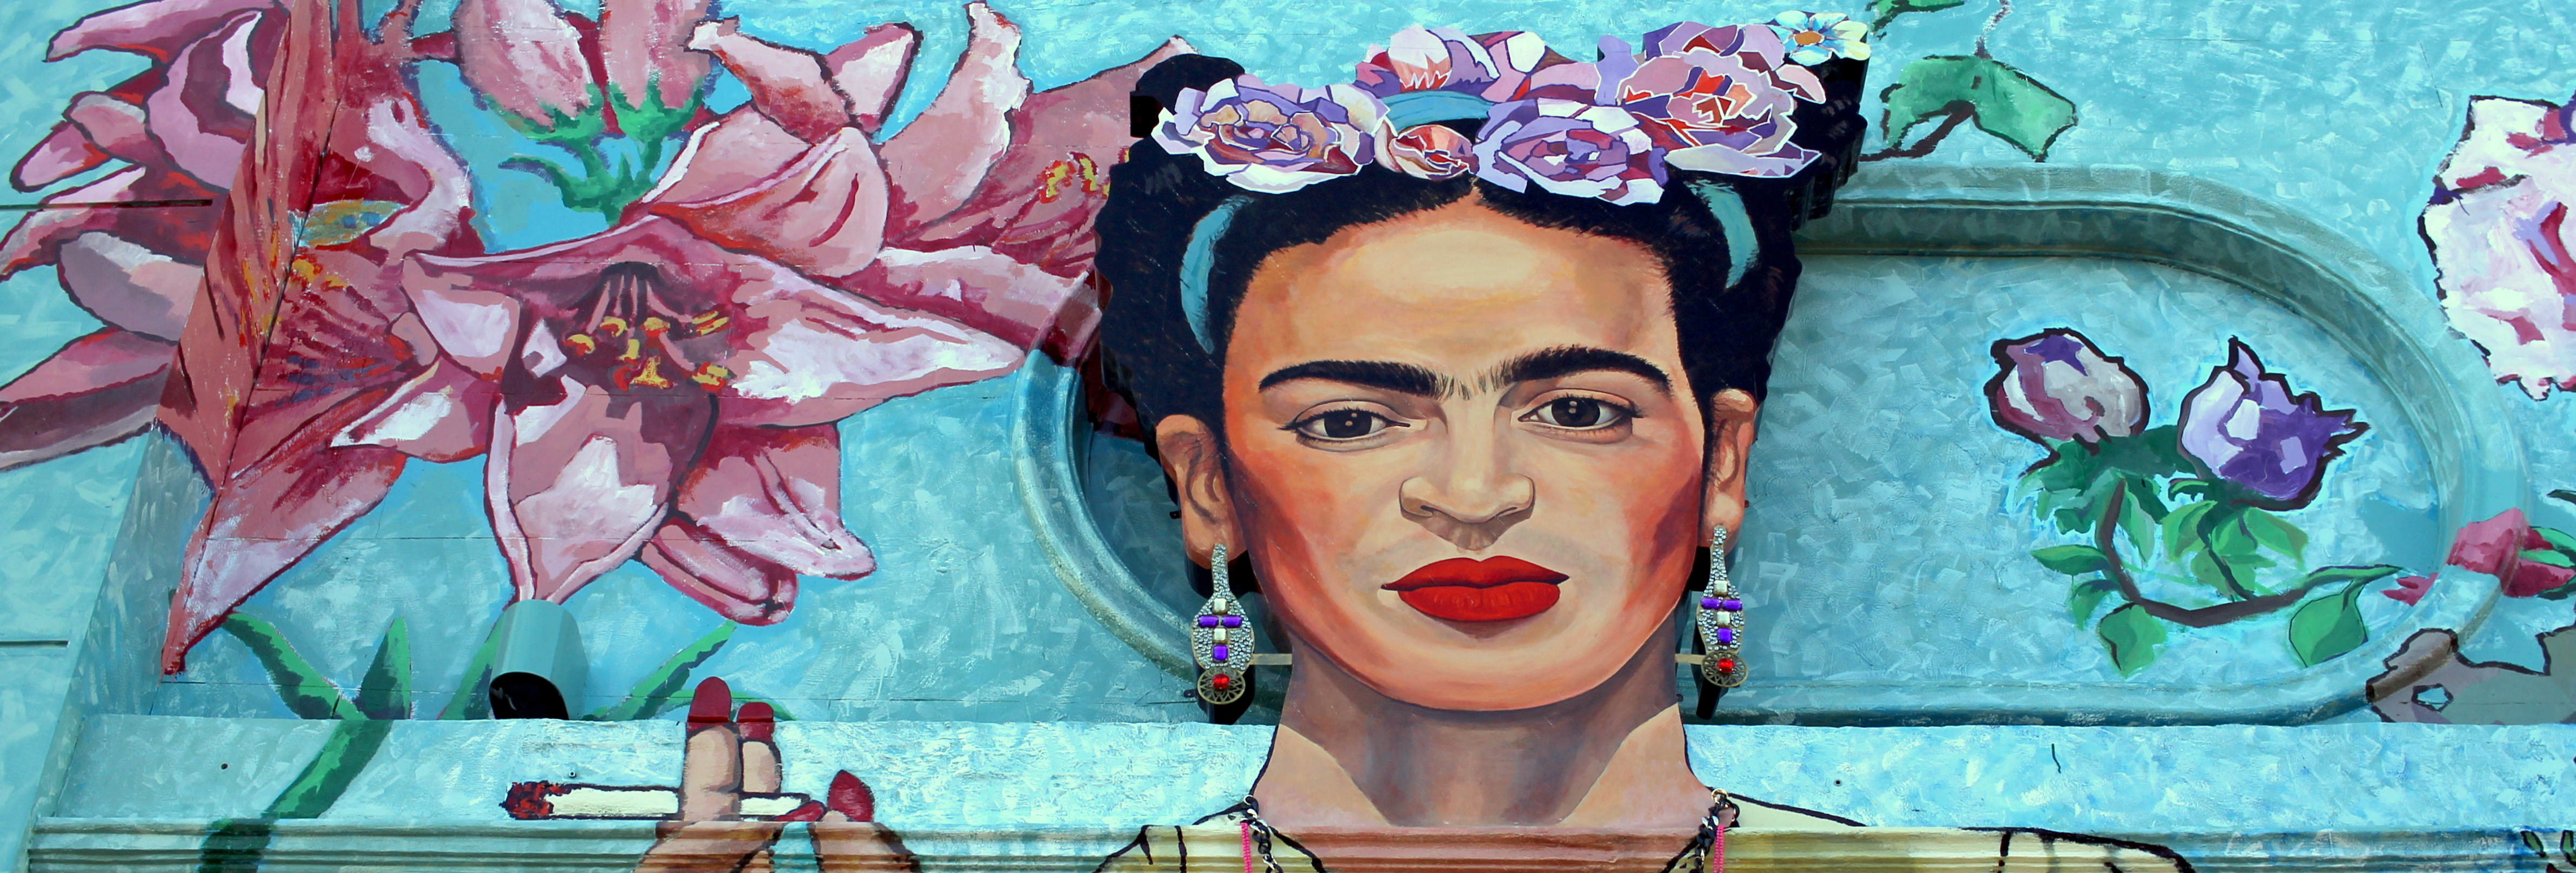 buenos aires murales frida kahlo graffitibaires buenosairesstreetart.com